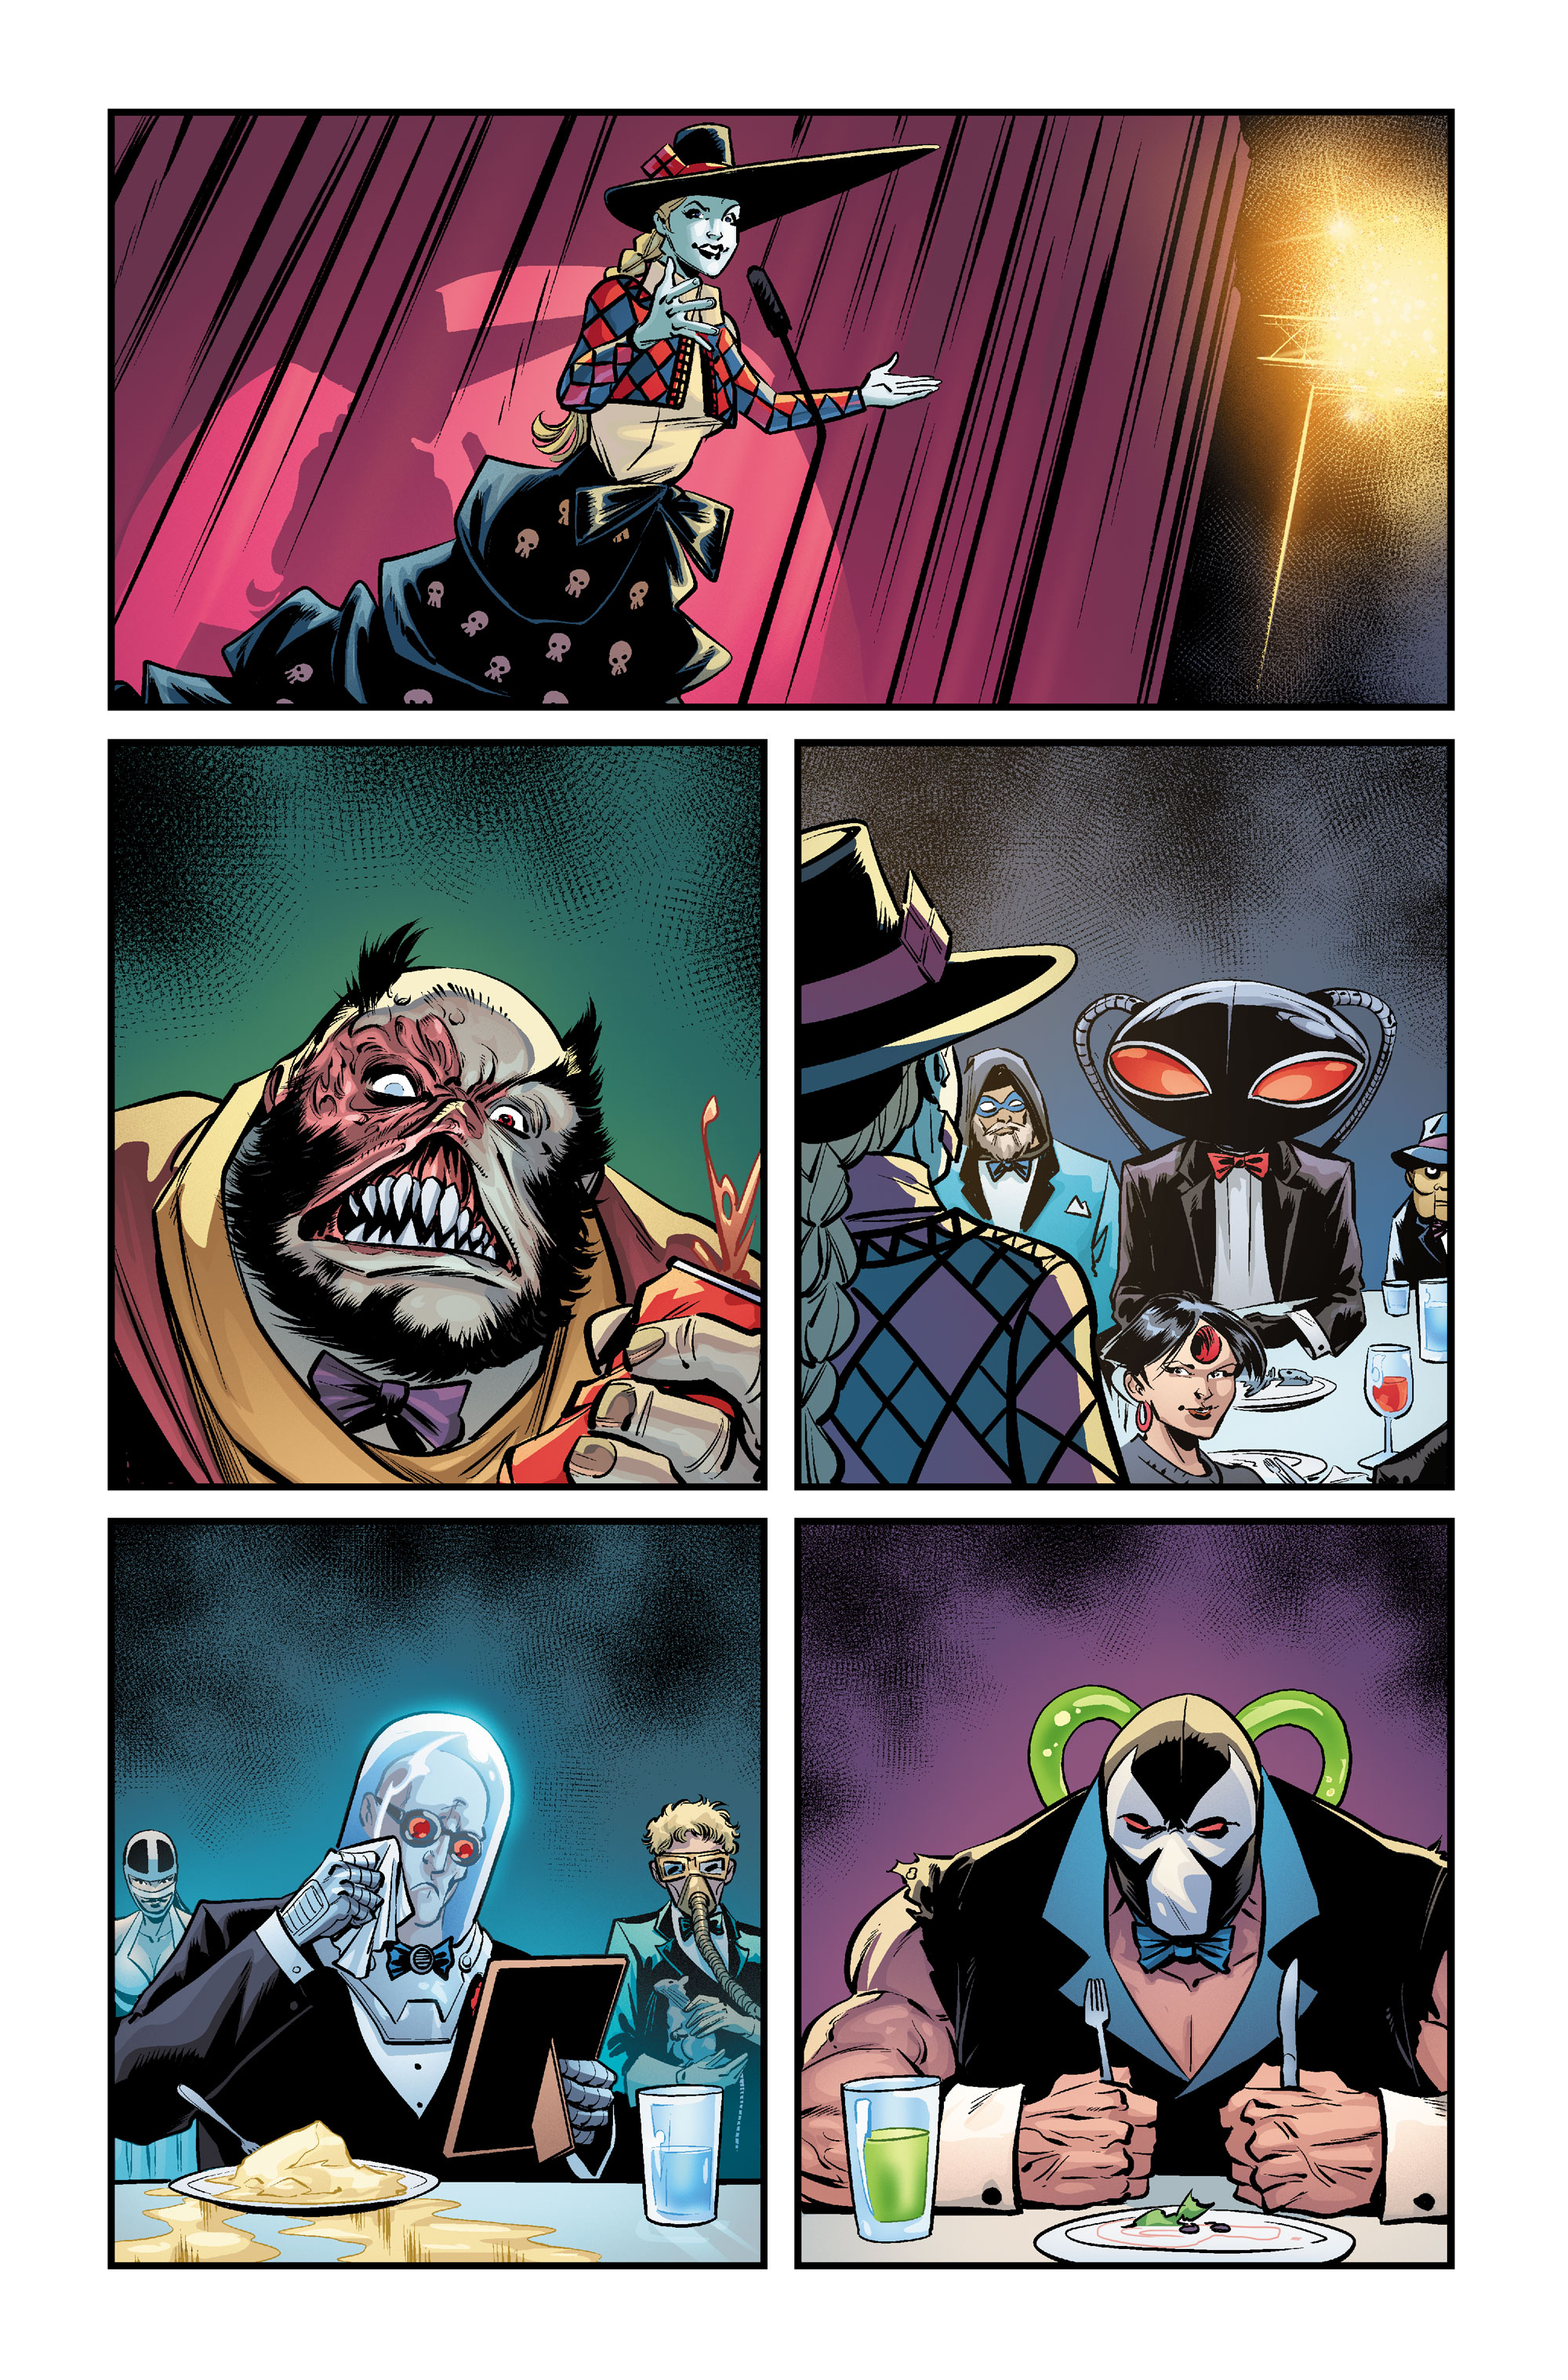 Black Manta? Bane? Who will be villain of the year?